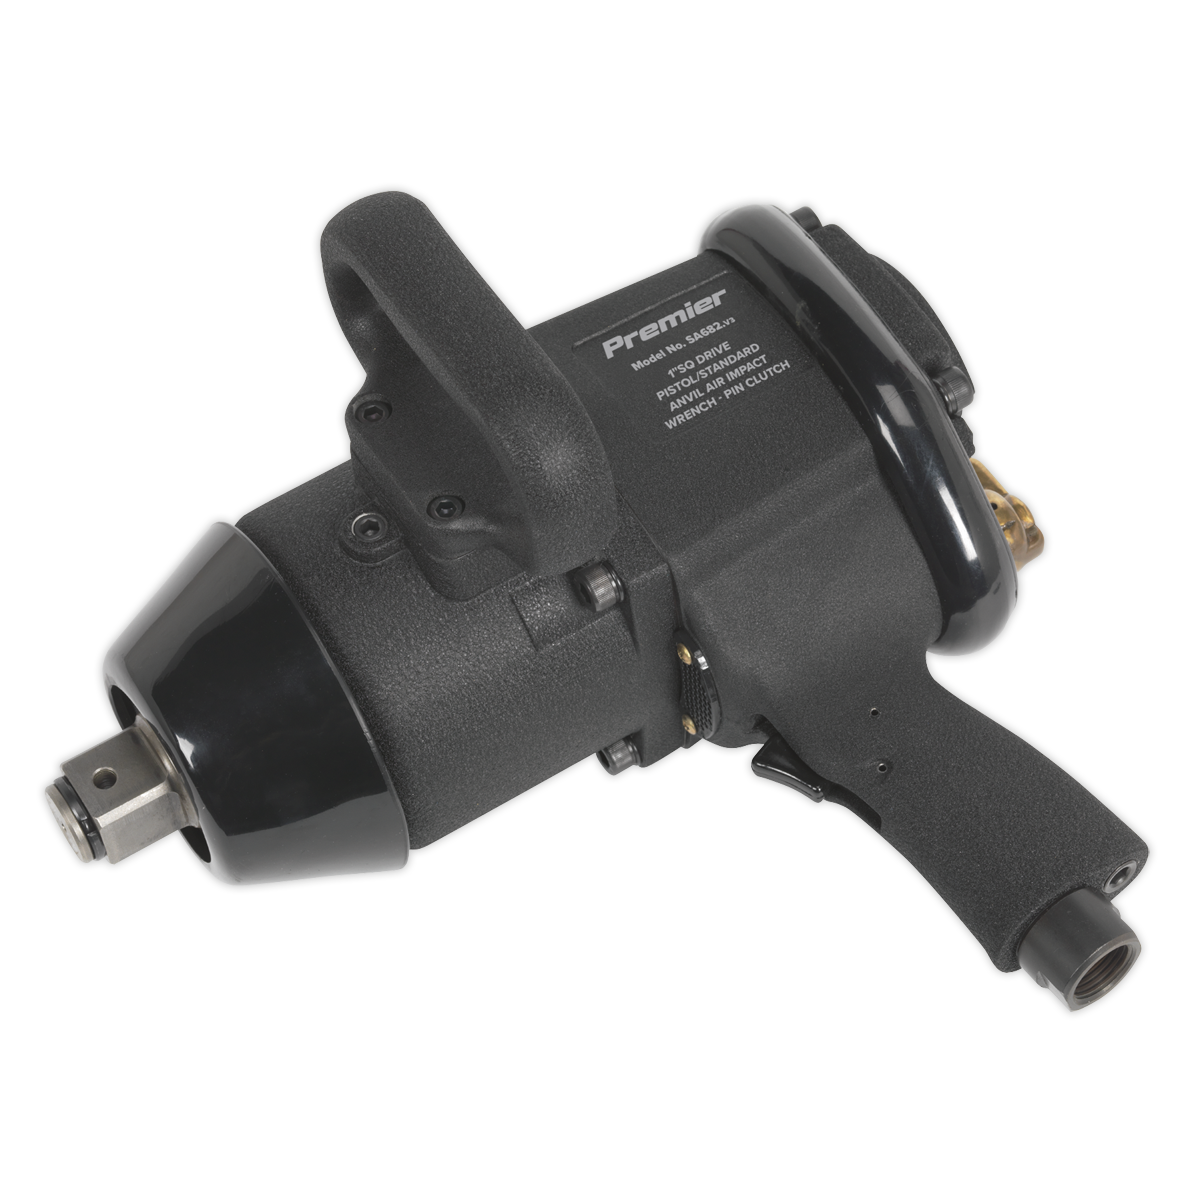 "Air Impact Wrench 1""Sq Drive Pin Clutch Pistol/Standard Anvil"